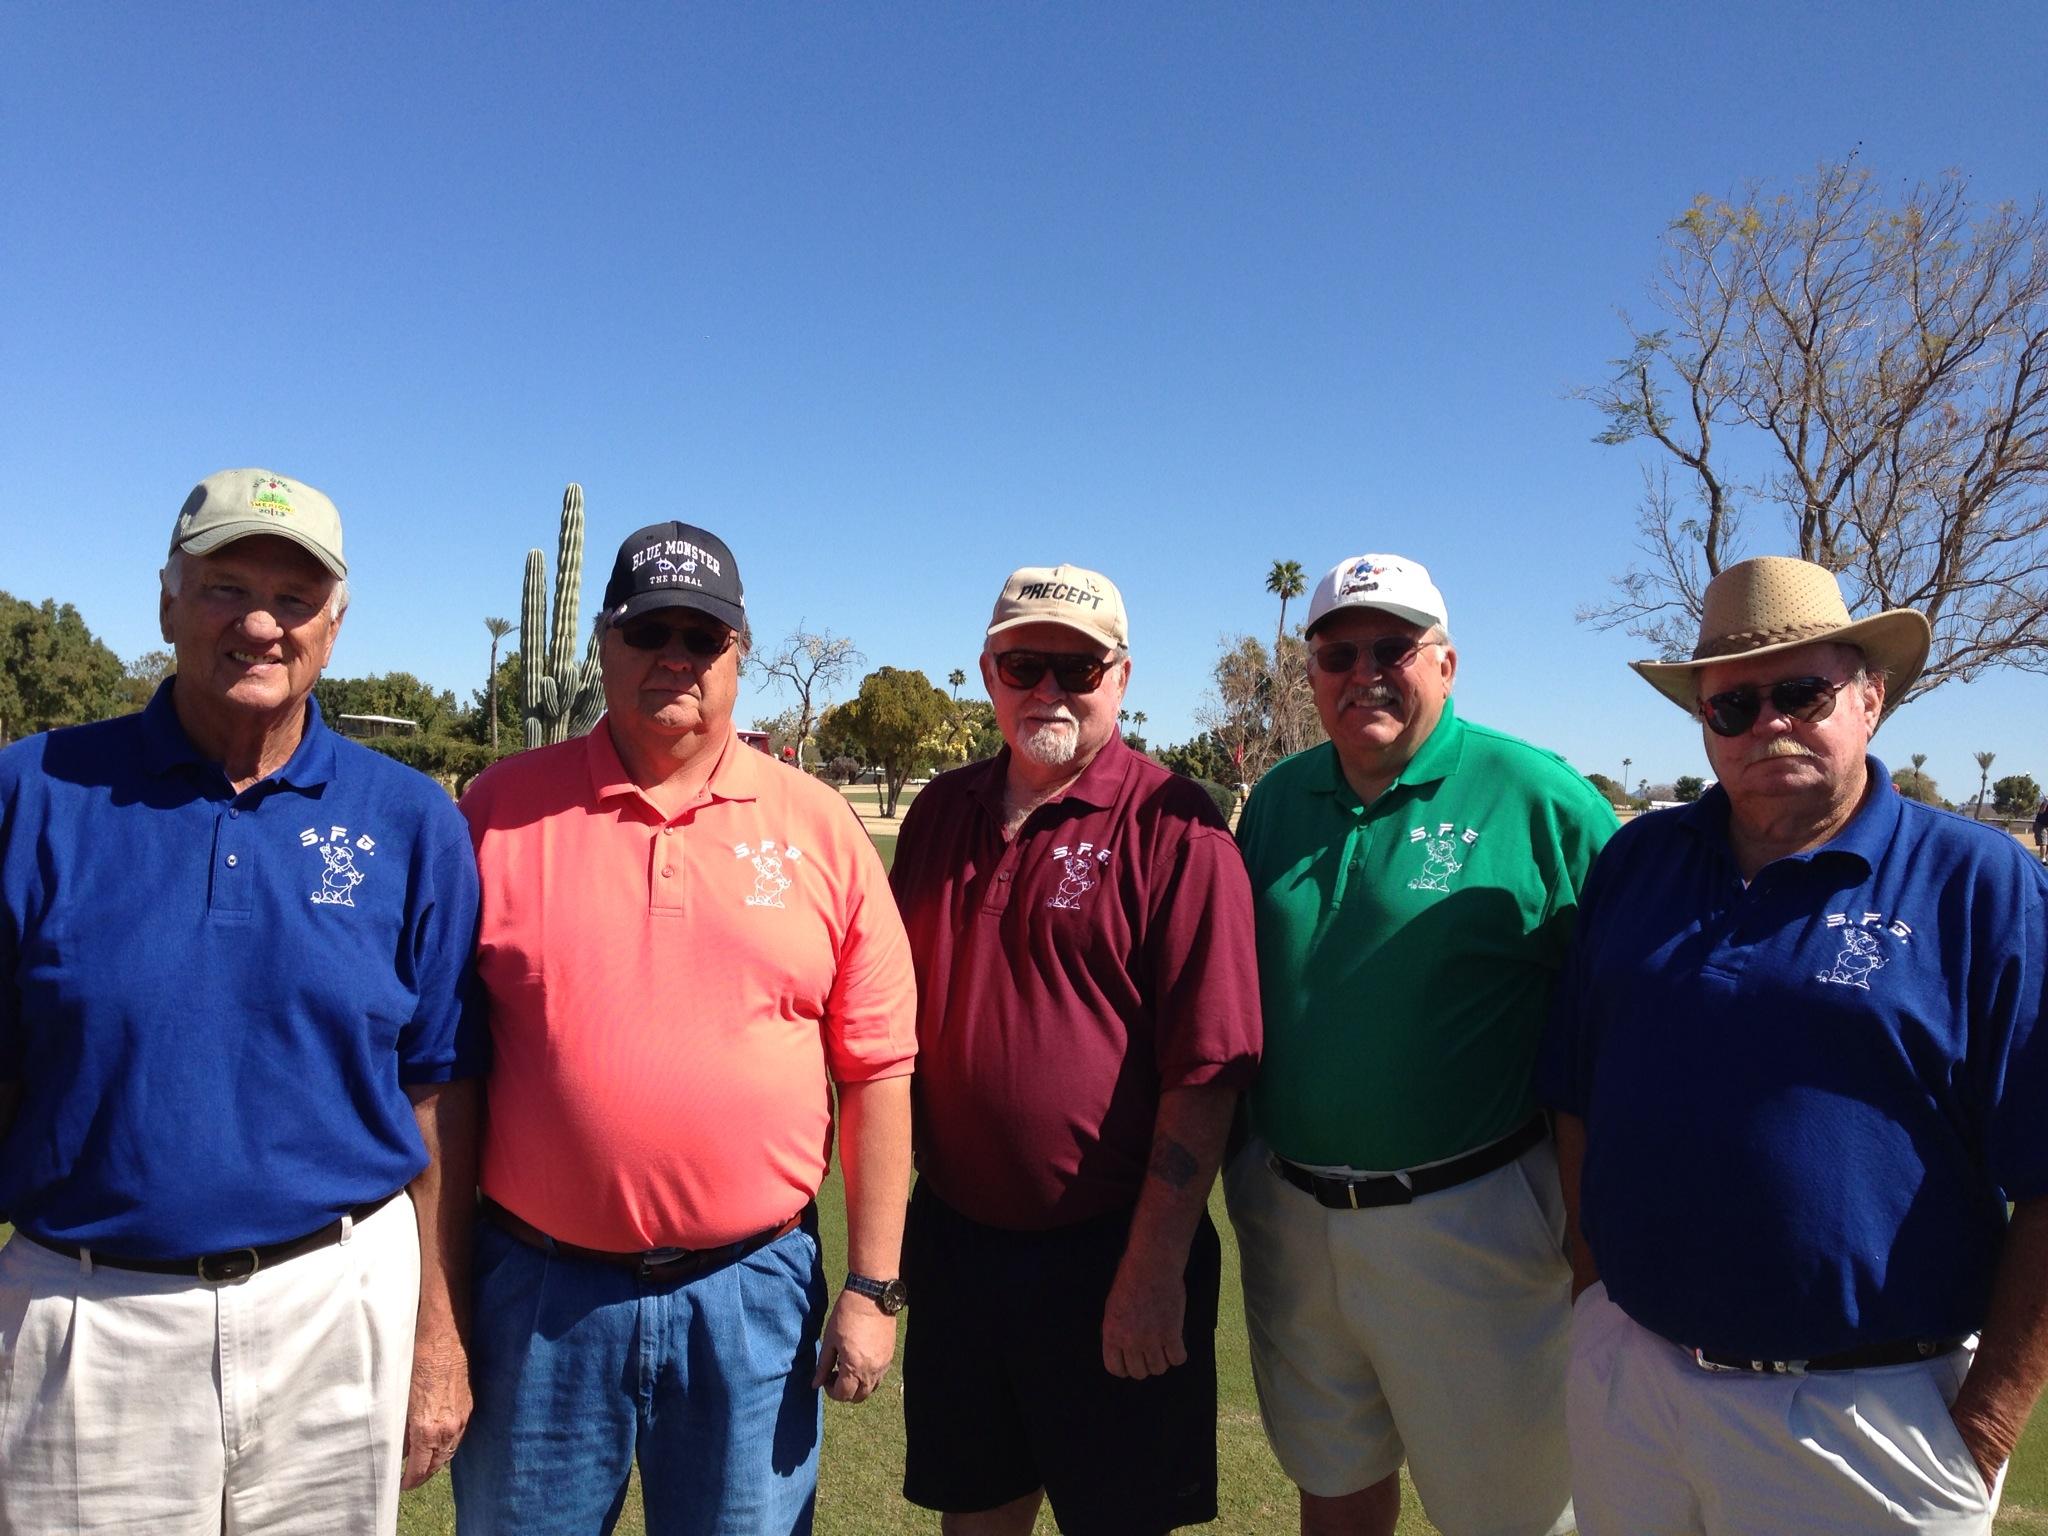 Shirt design course - Six Fat Guys Golf Club T Shirt Photo